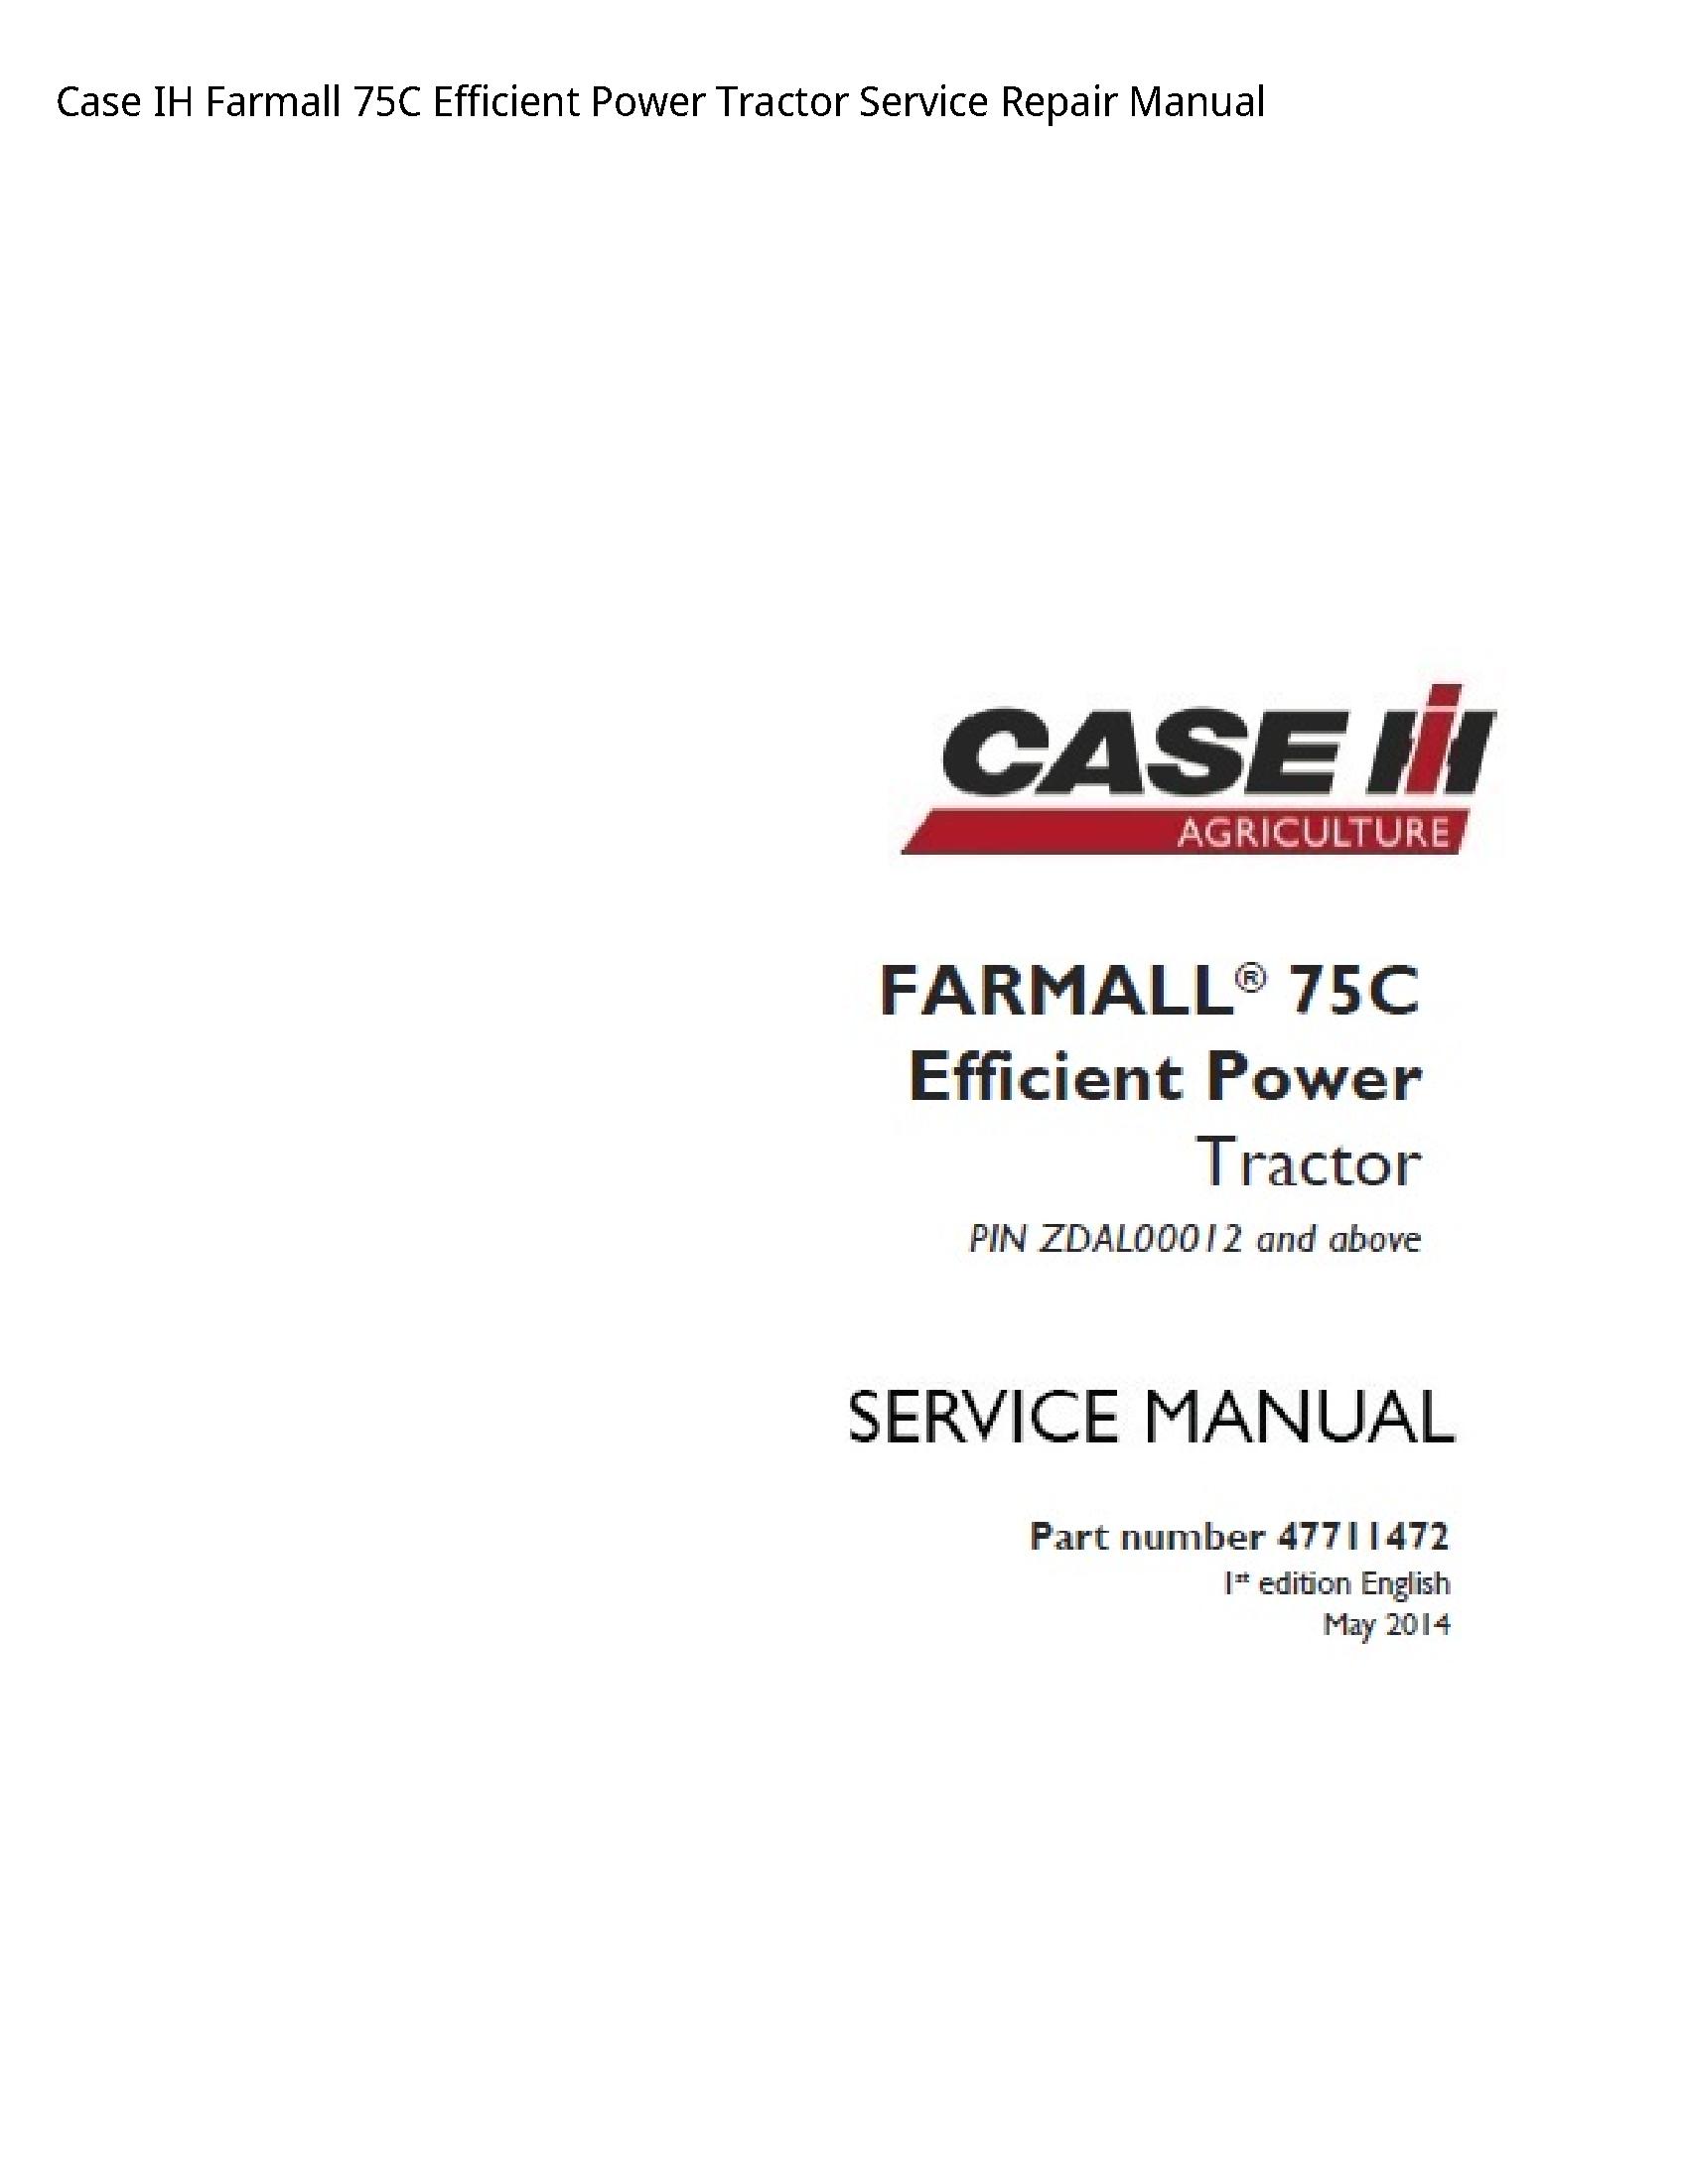 Case/Case IH 75C IH Farmall Efficient Power Tractor manual